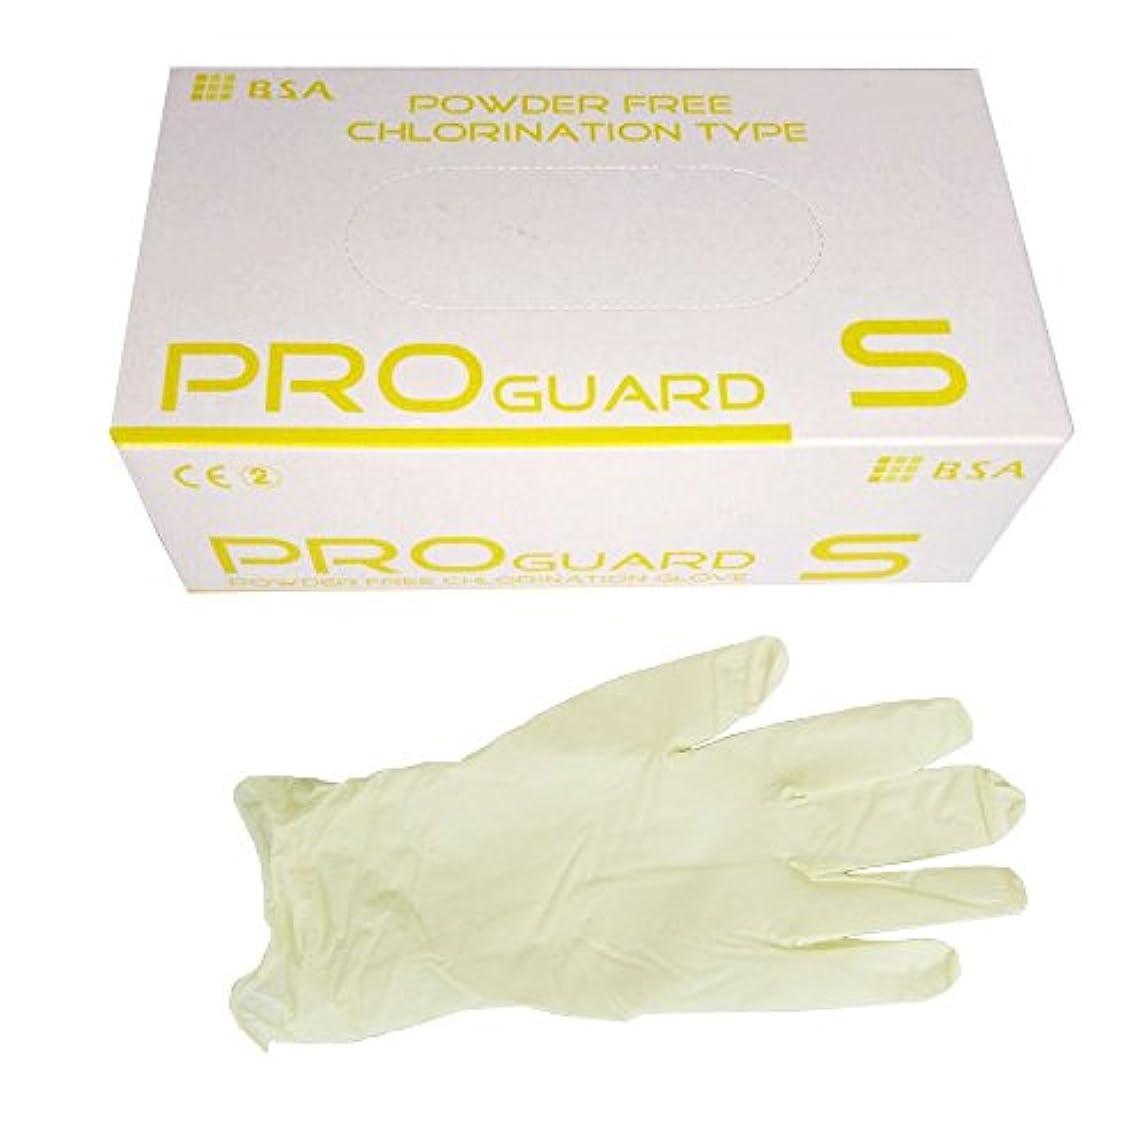 B.S.Aプロガードパウダリーフリー滑り止め加工付 塩素処理タイプS